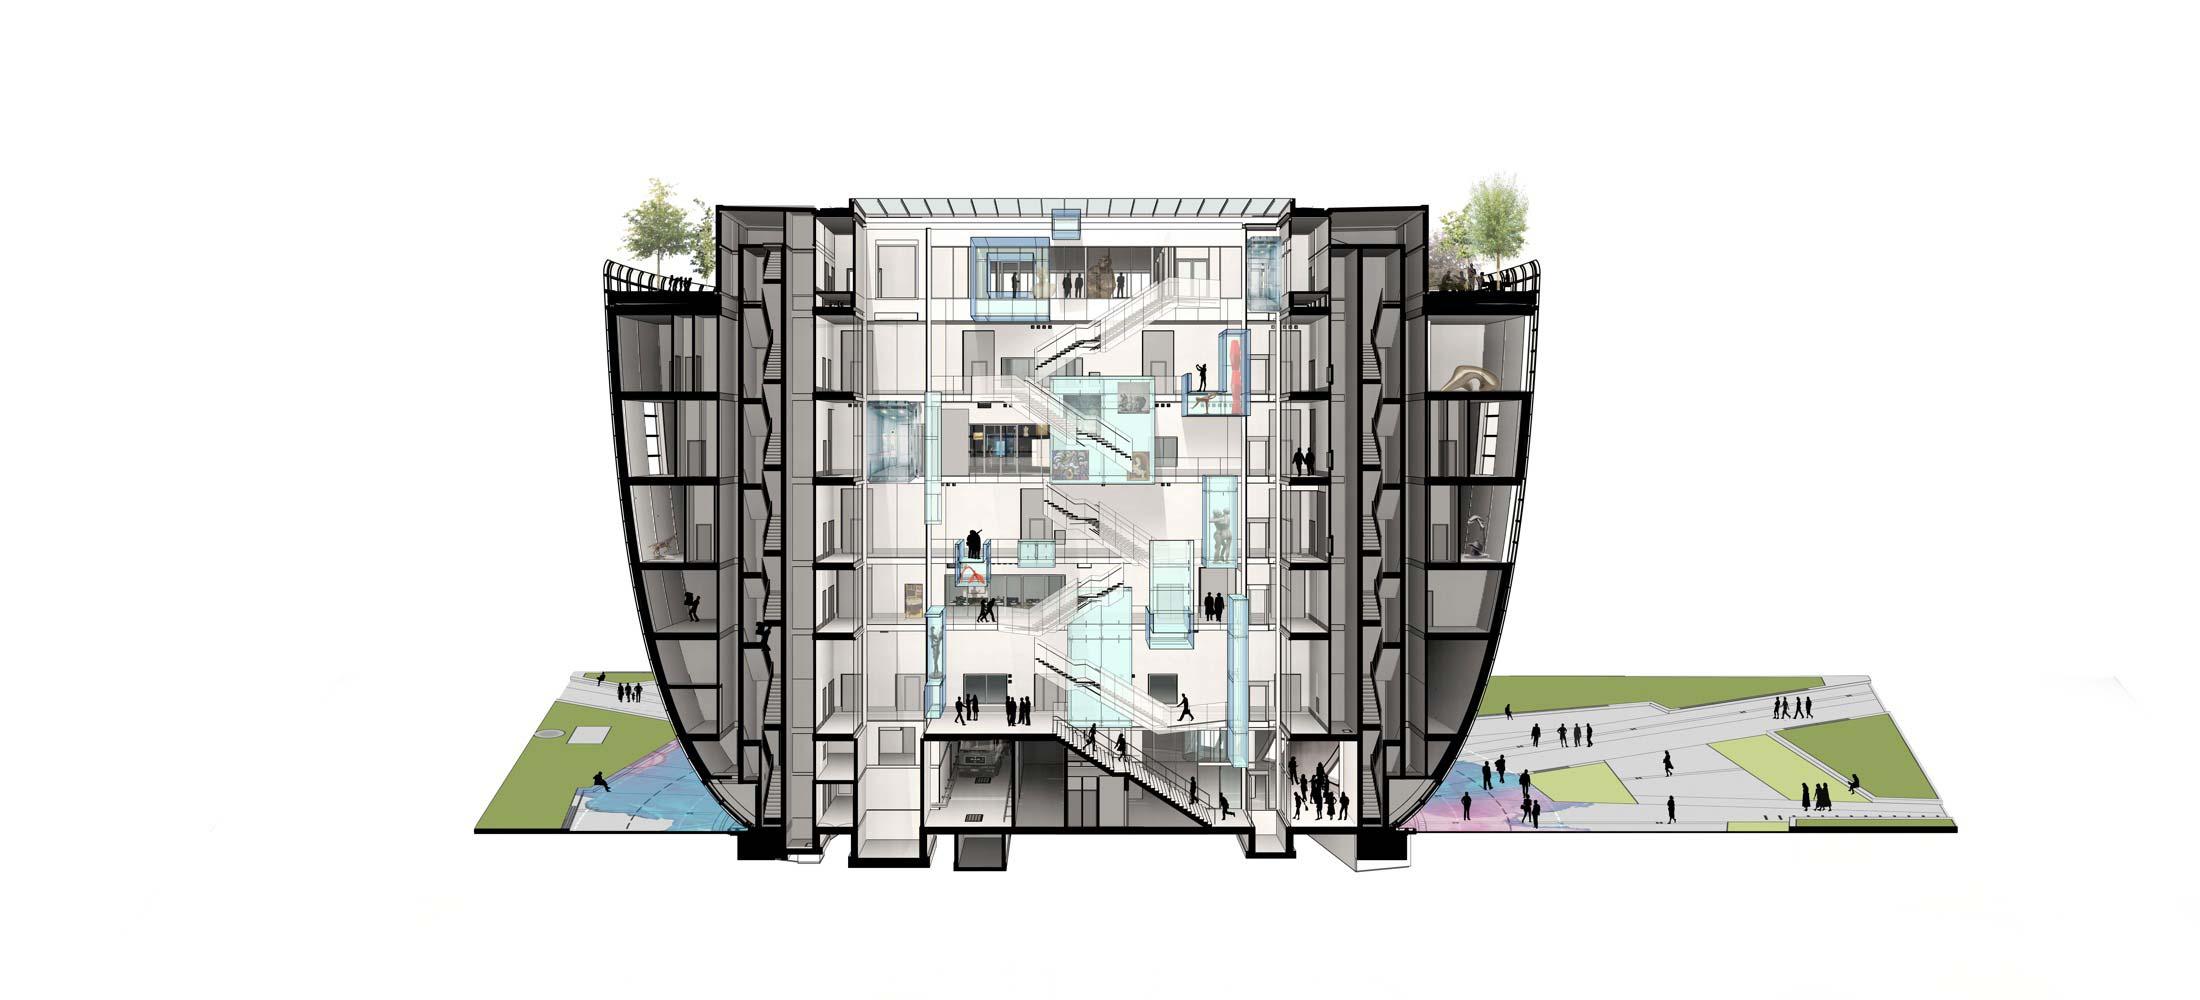 The MAZE in the heart of DEPOT Boijmans van Beuningen-cross-section